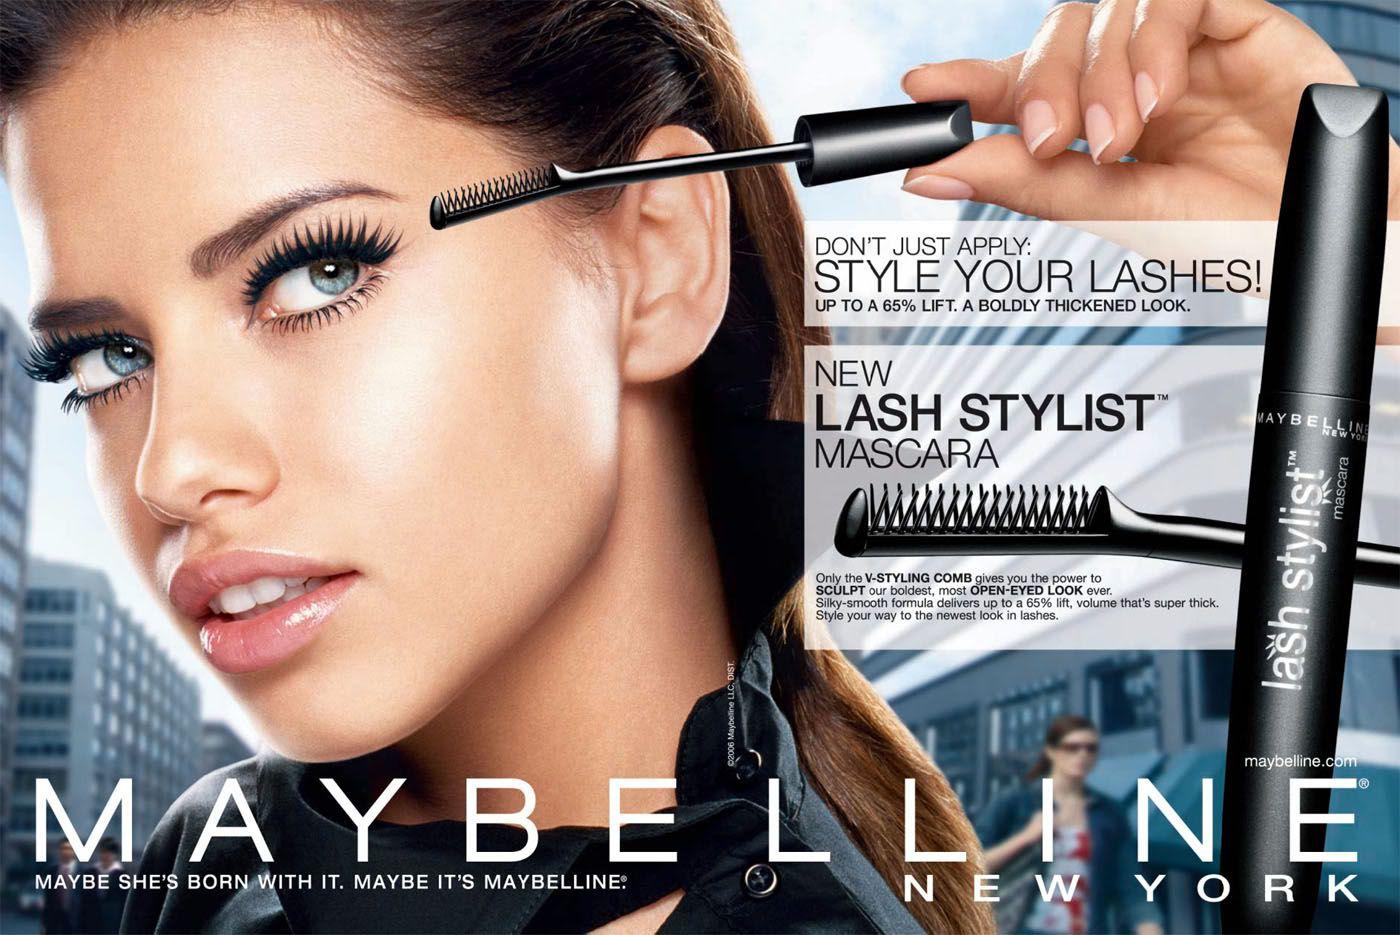 Trang điểm mắt Maybelline